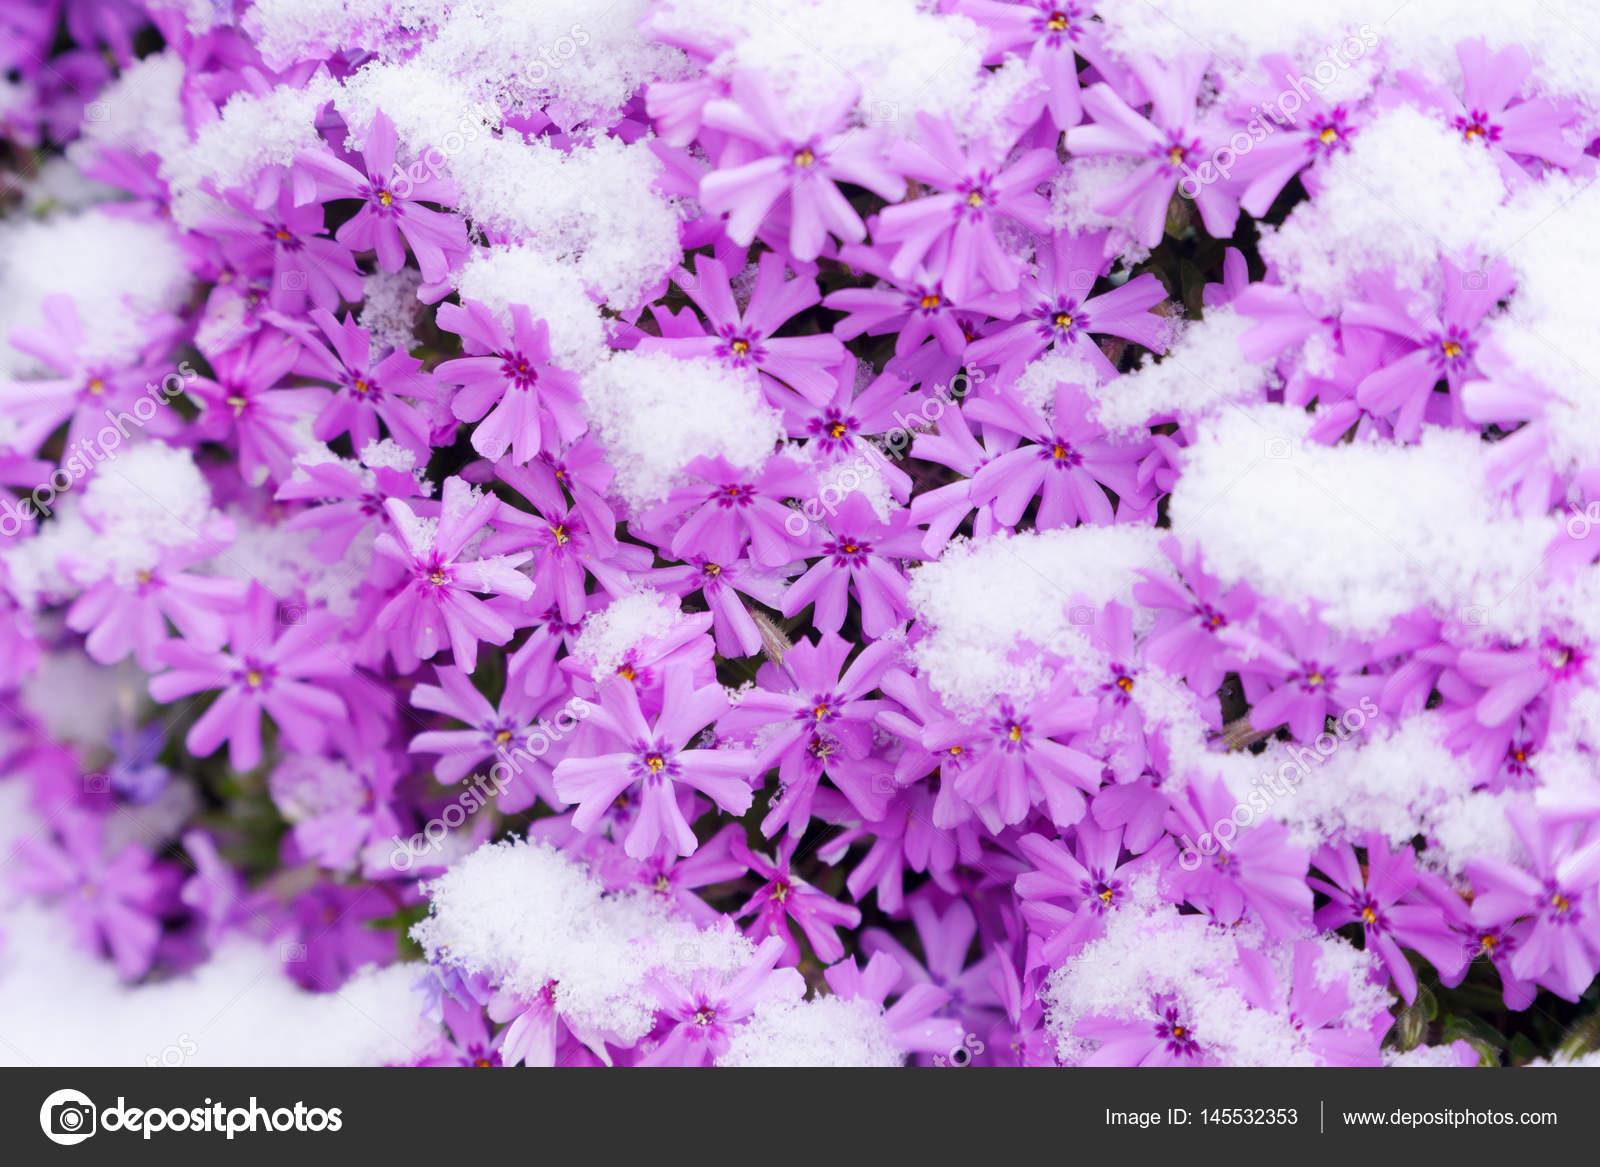 Flowers and snow \u2014 Stock Photo © kzlobastov 145532353